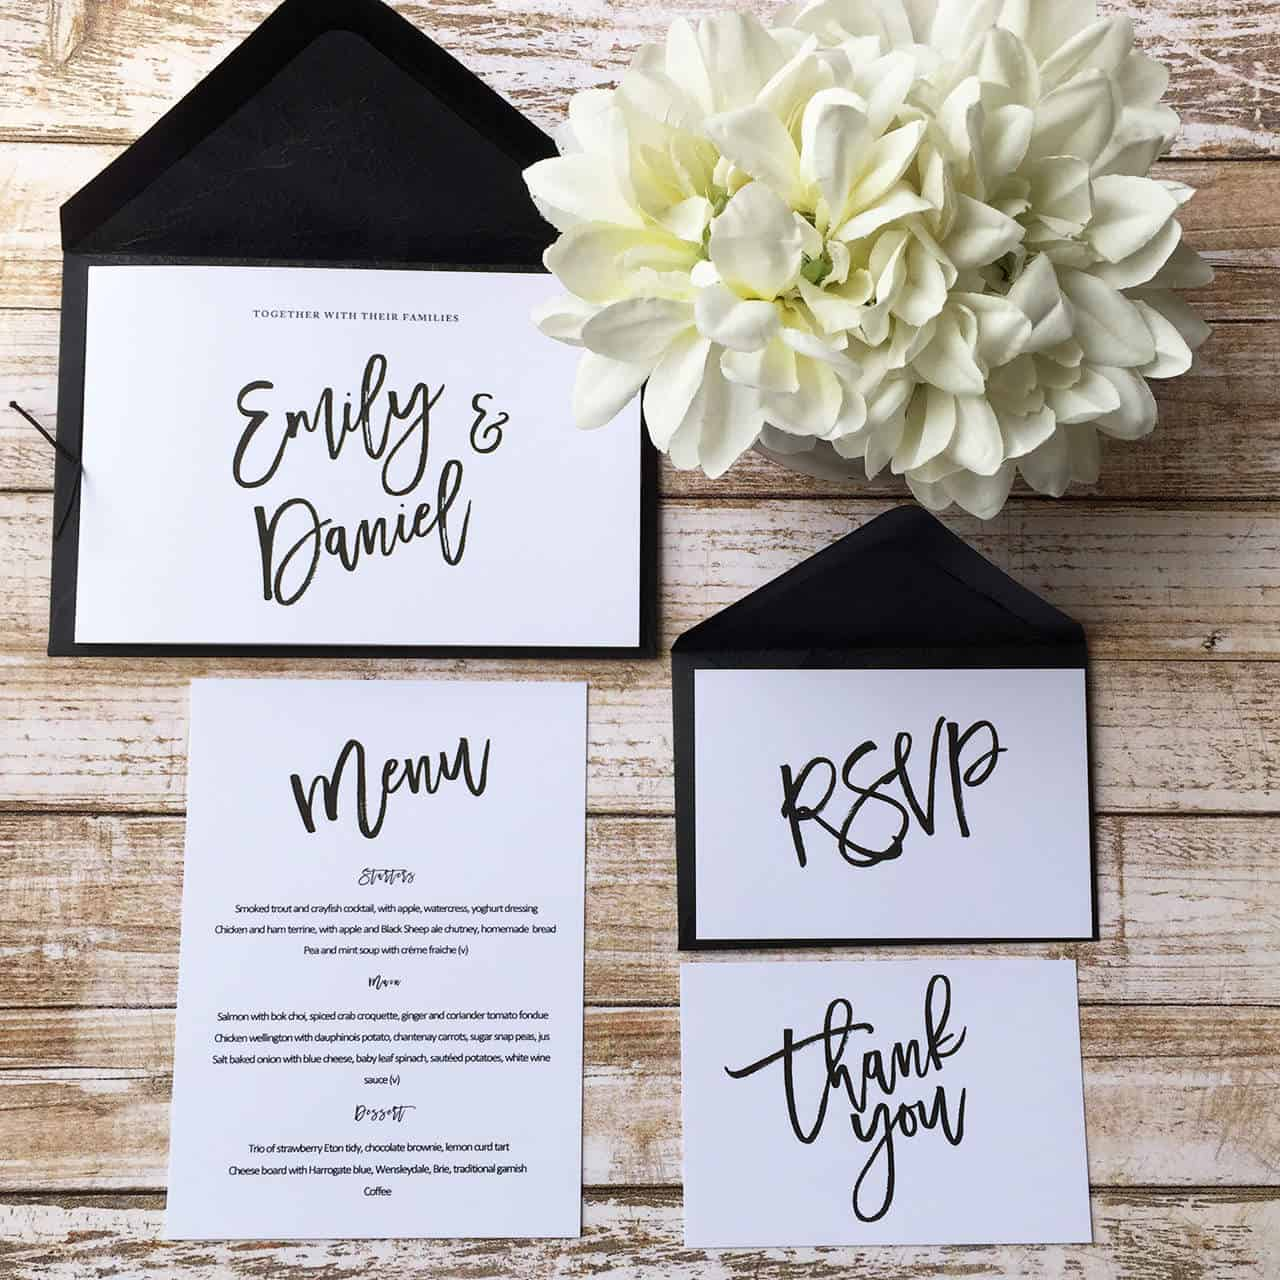 Chic Wedding Invitations and Stationery Deposit |